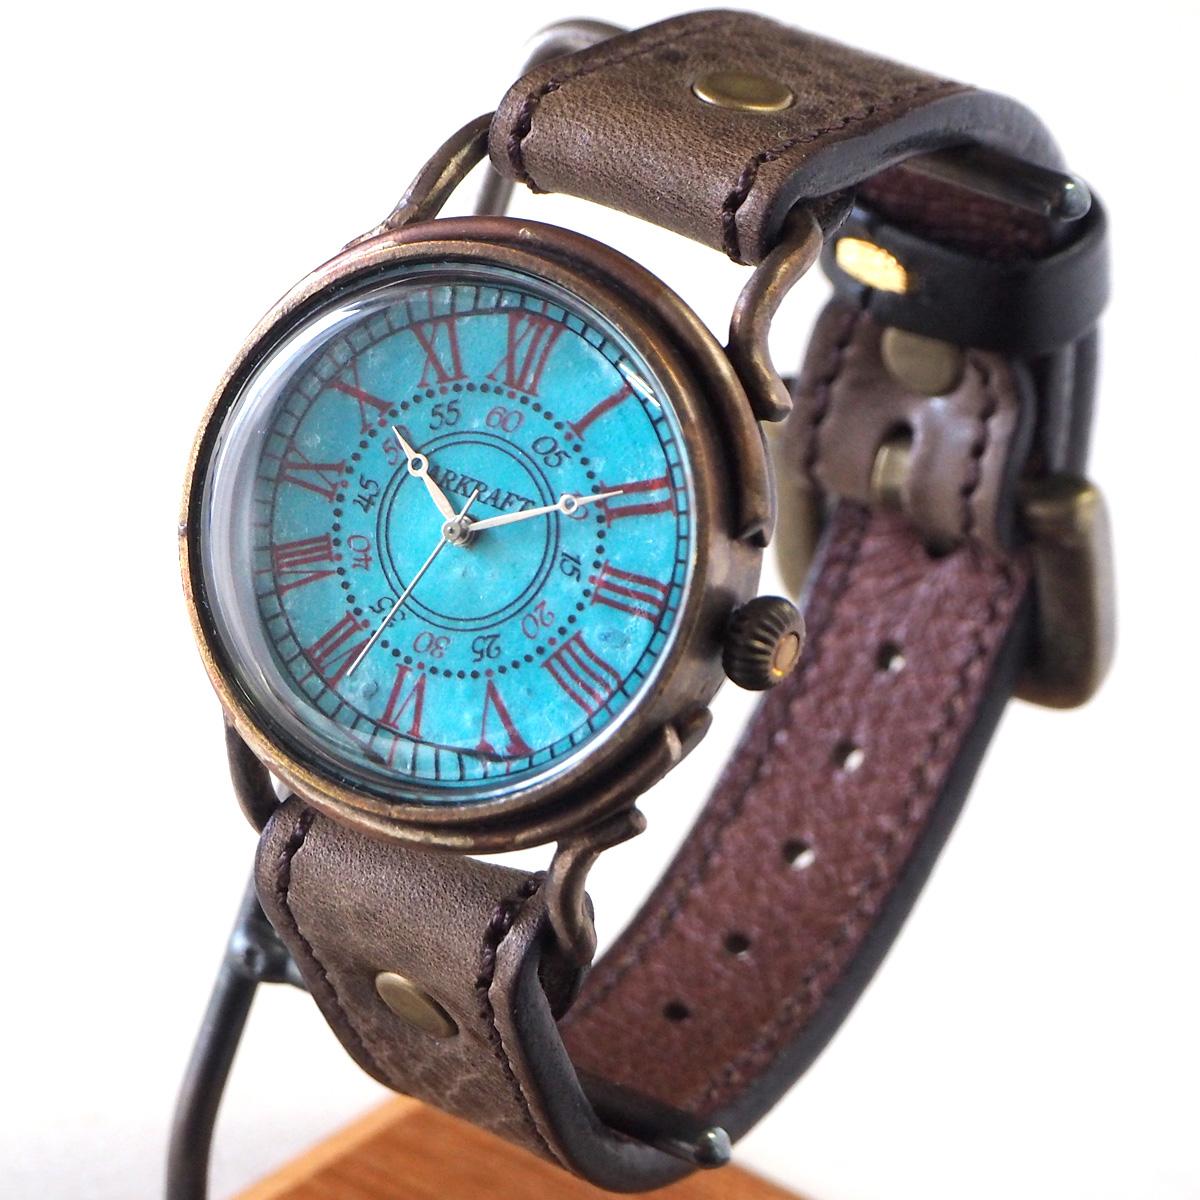 "ARKRAFT(アークラフト)手作り腕時計""Addy Large"" ローマ数字 プレミアムストラップ [AR-C-016-RO] 時計作家 新木秀和 ハンドメイドウォッチ ハンドメイド腕時計 手作り時計 本革ベルト ターコイズブルー 青 ブルー クオーツ アナログ 日本製 国産"